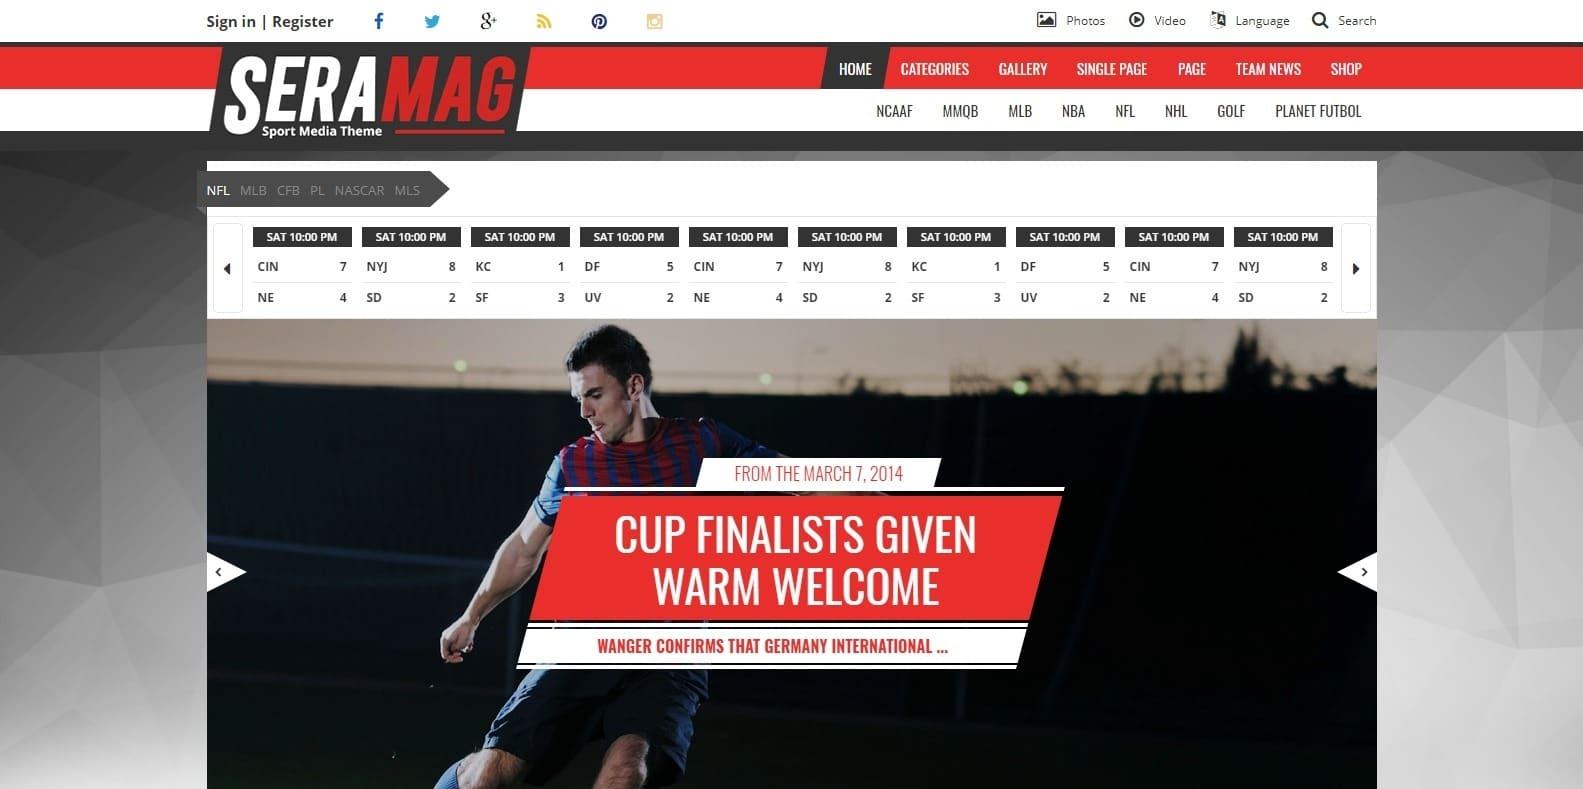 seramag-sports-website-template